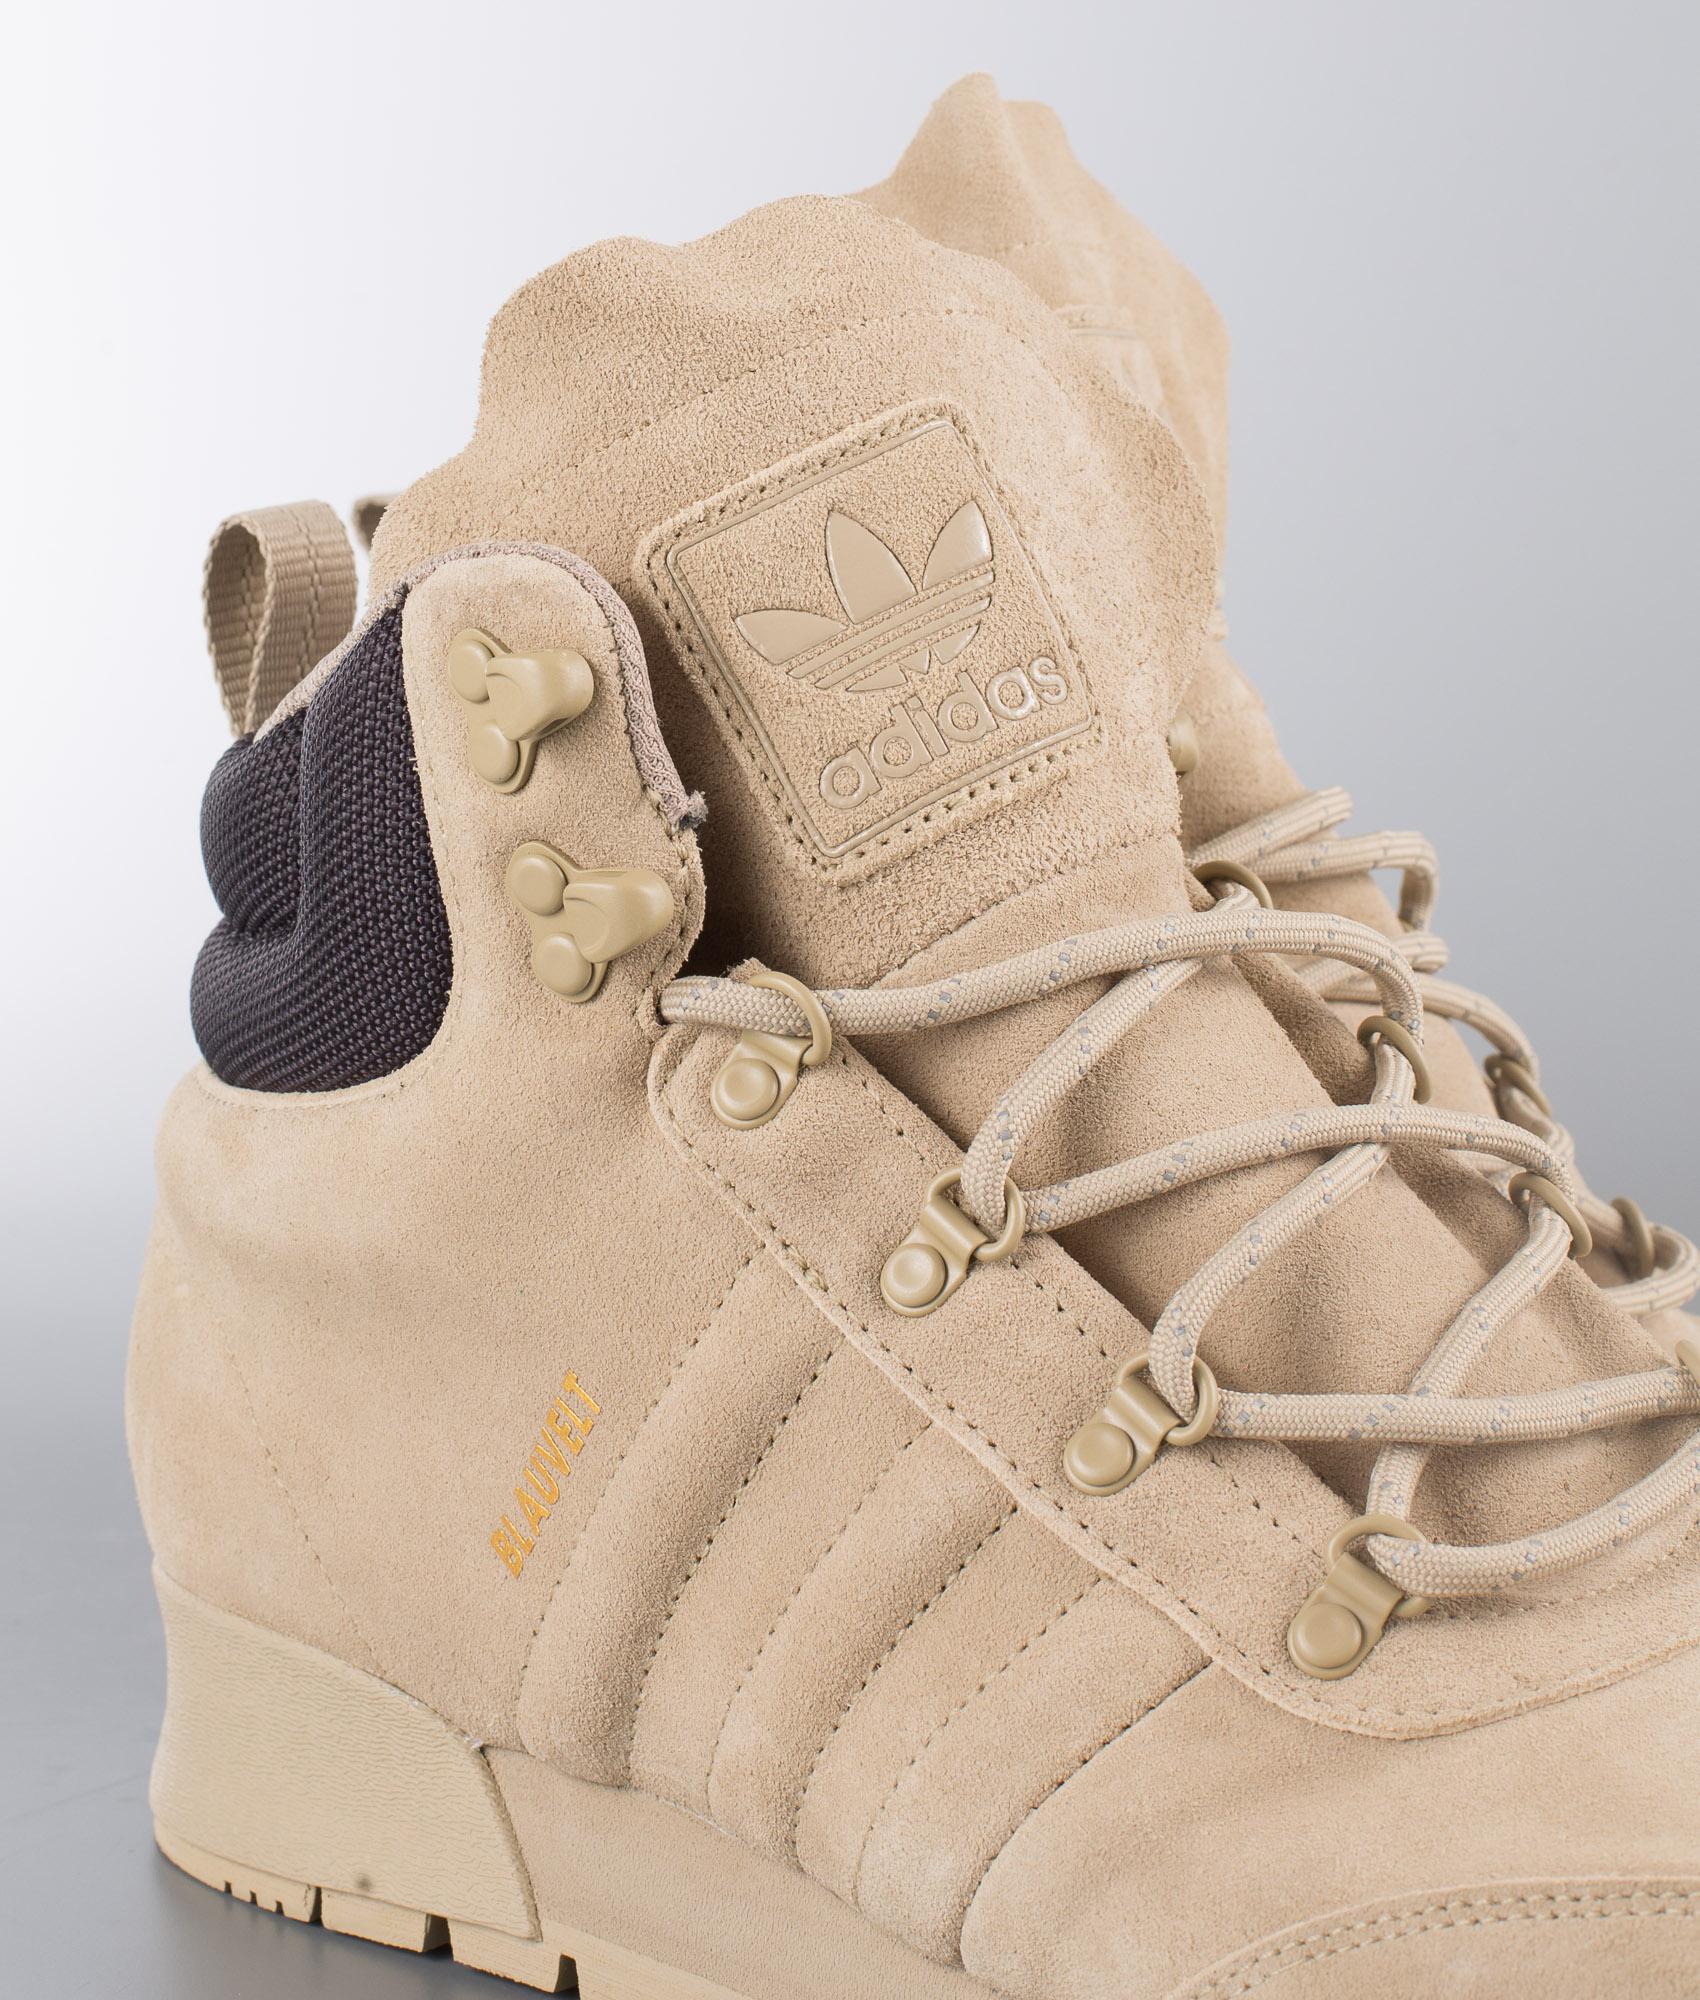 0 Boot Adidas Raw Skateboarding De 2 Chaussures Gold Jake Chez E4UqITUwW